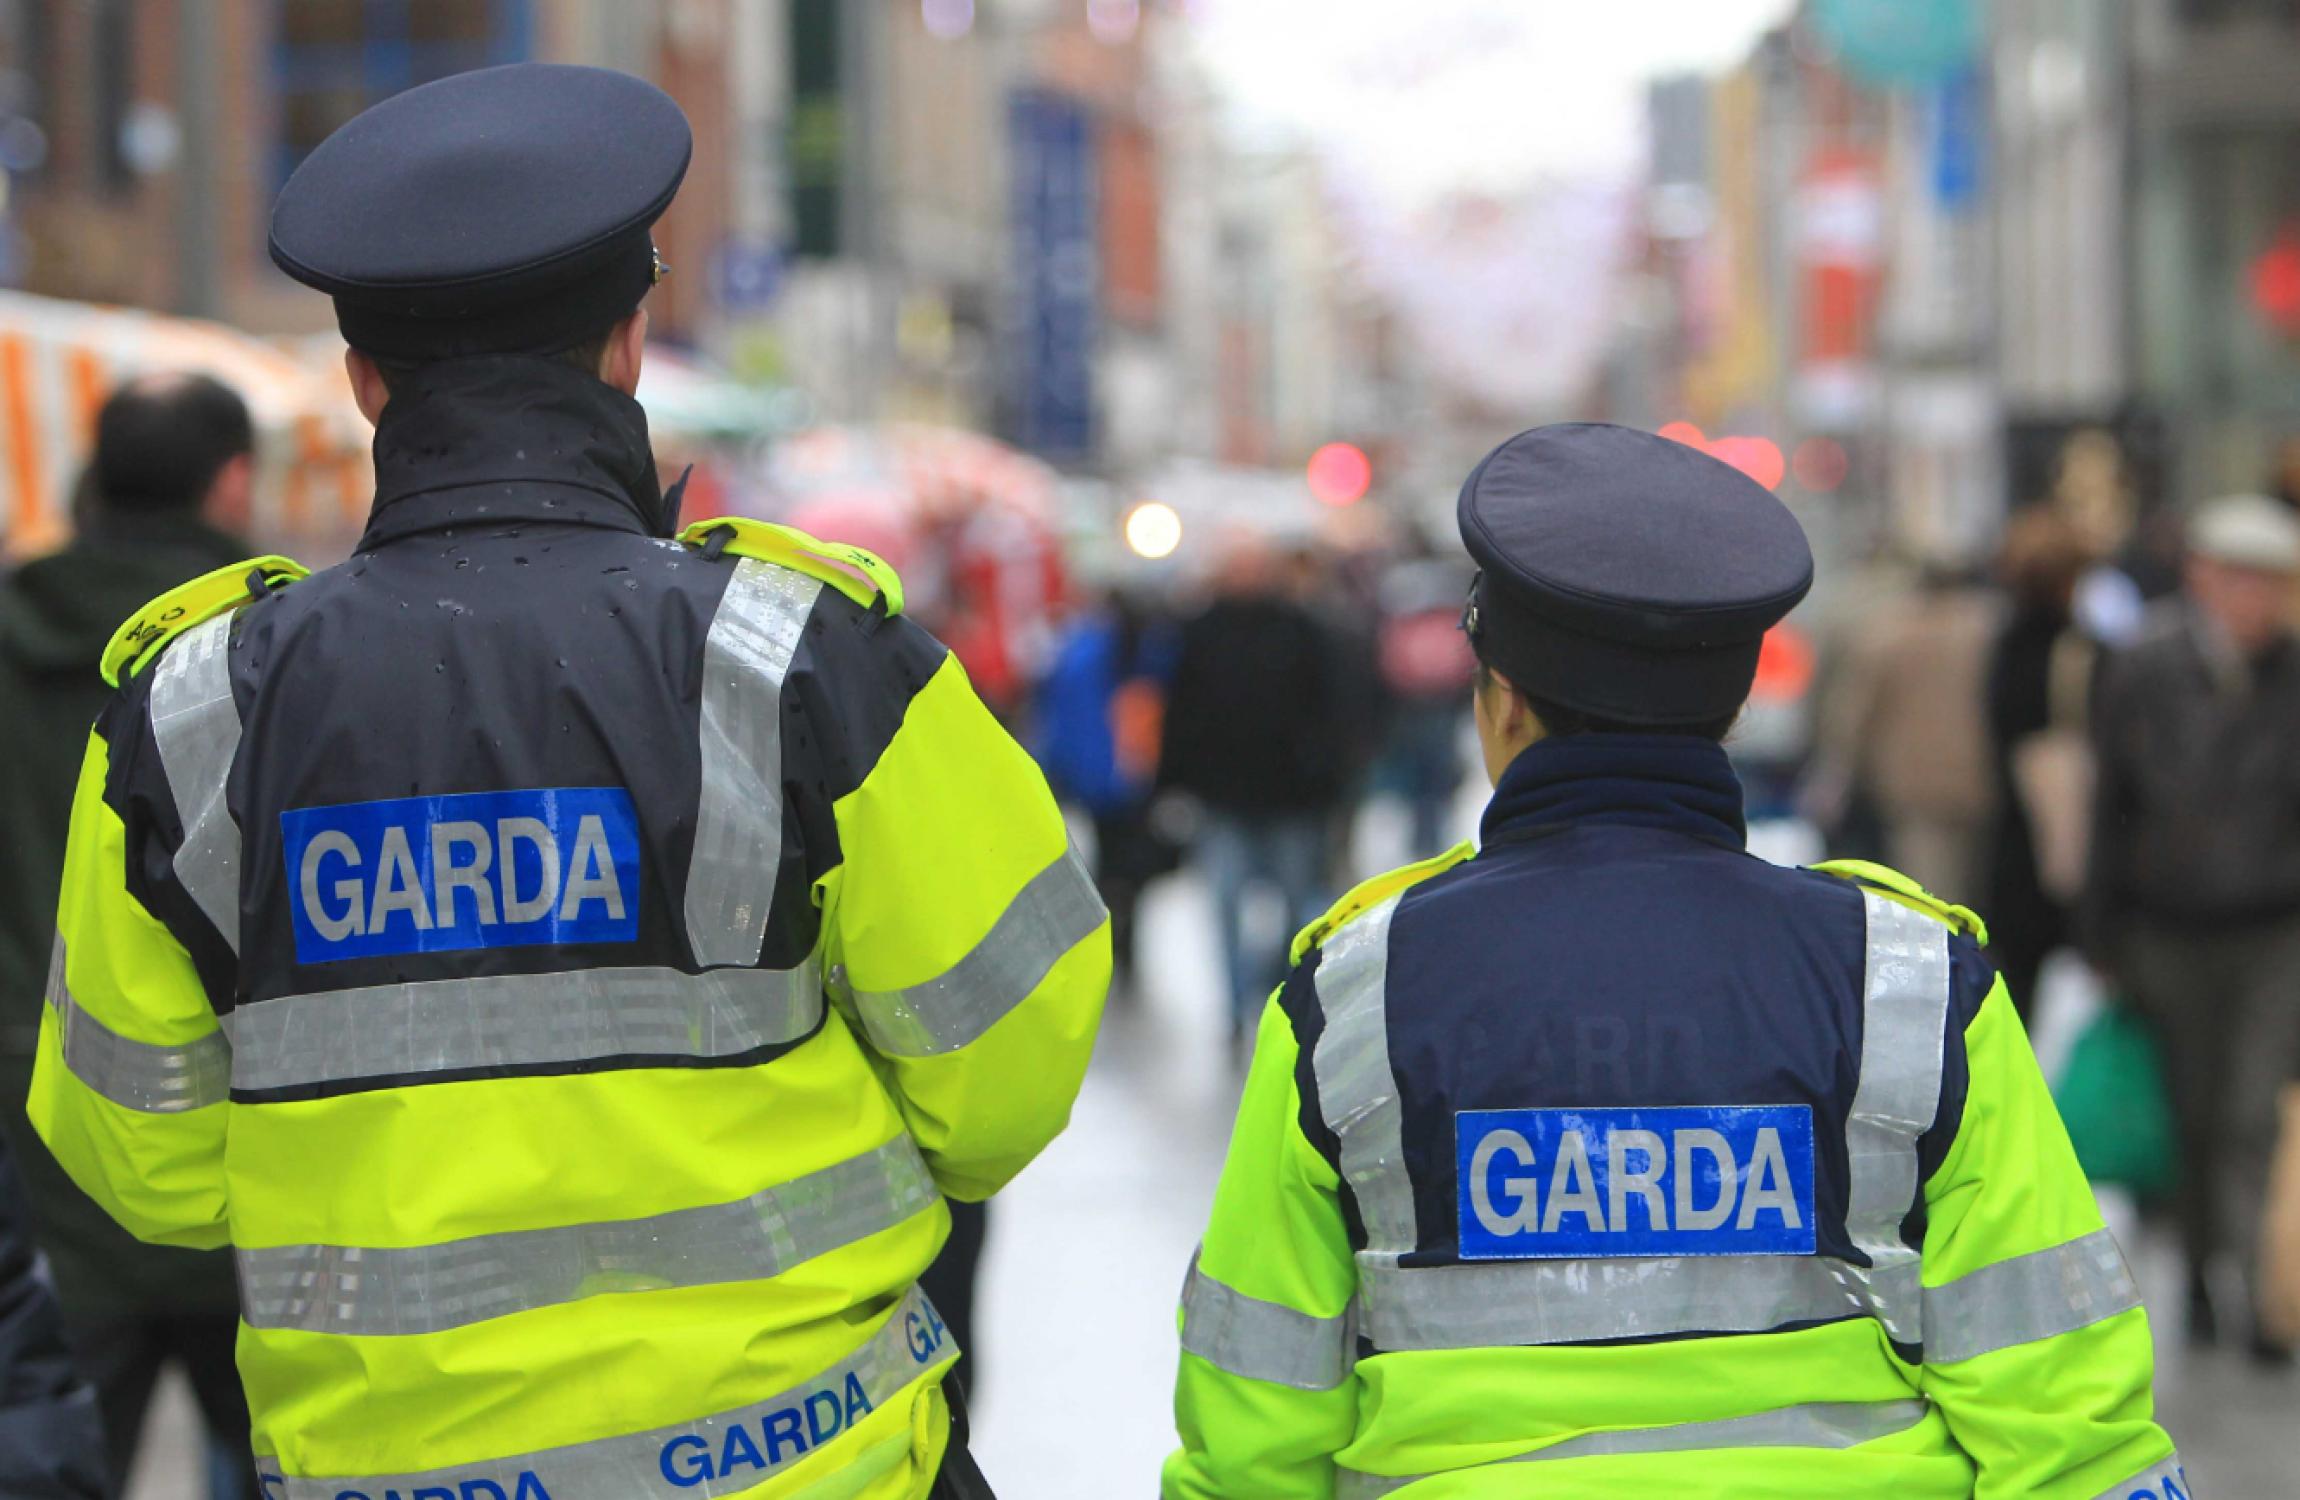 Two arrested after gardaí injured in Finglas attack